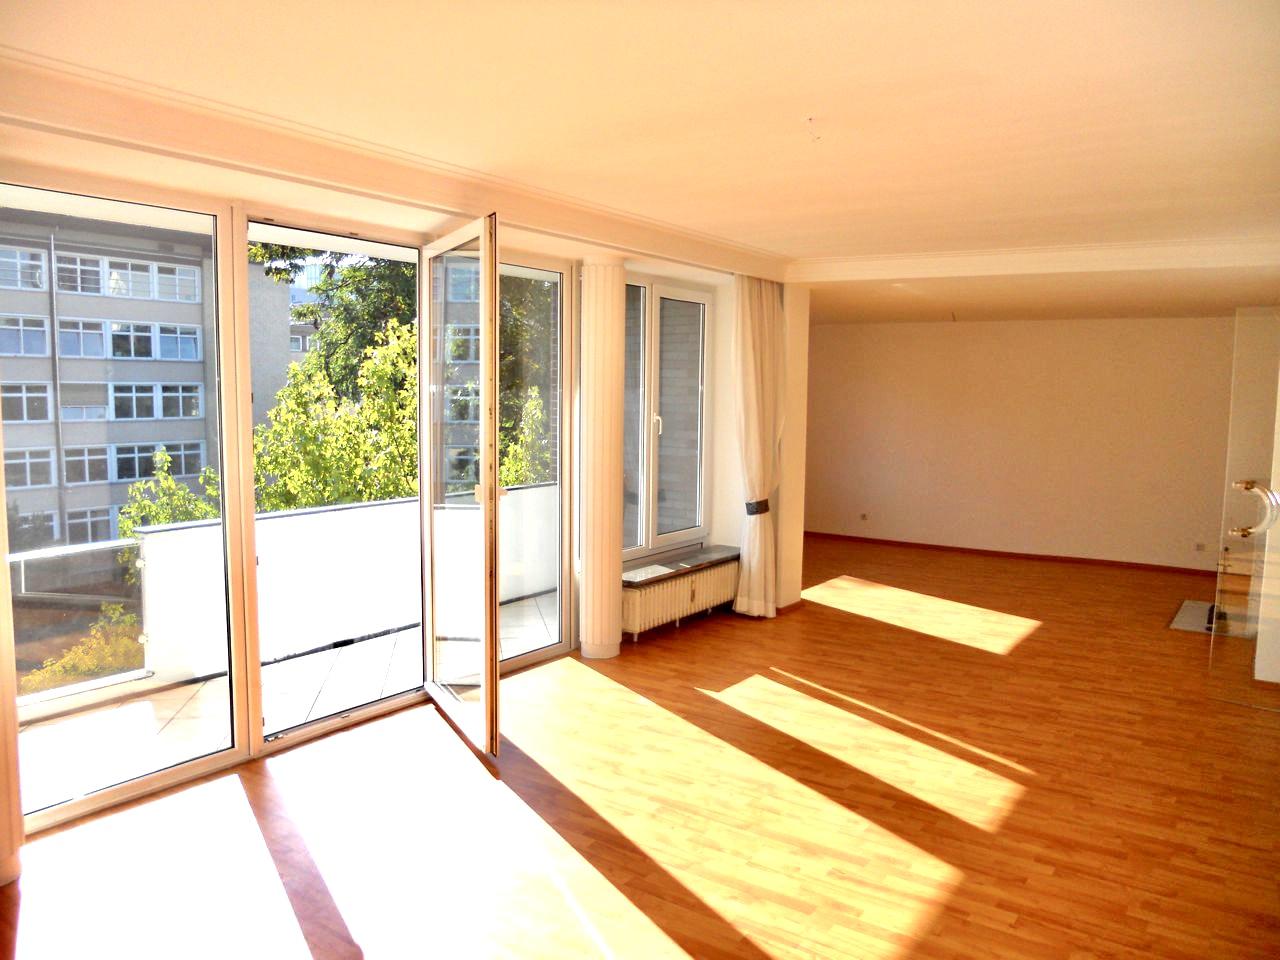 Sonniges Apartment mit Terrasse